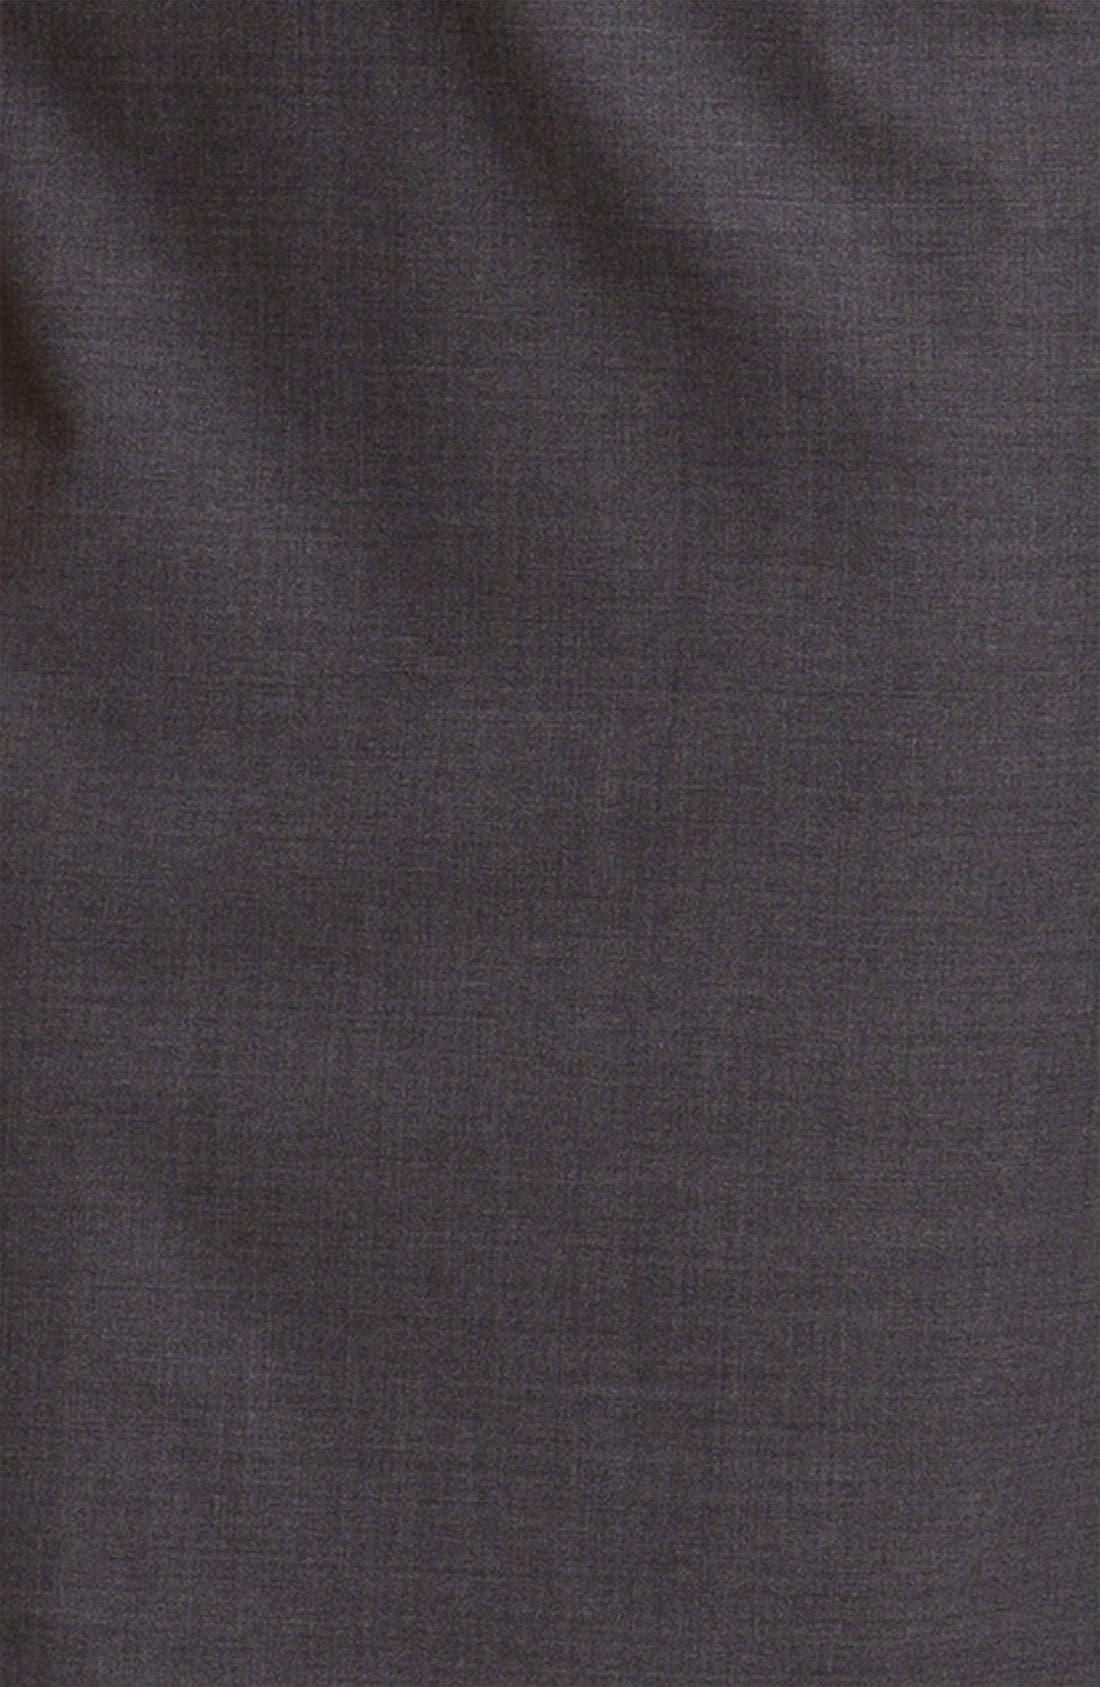 Alternate Image 3  - Rachel Roy 'Cord' Tropical Wool Sheath Dress